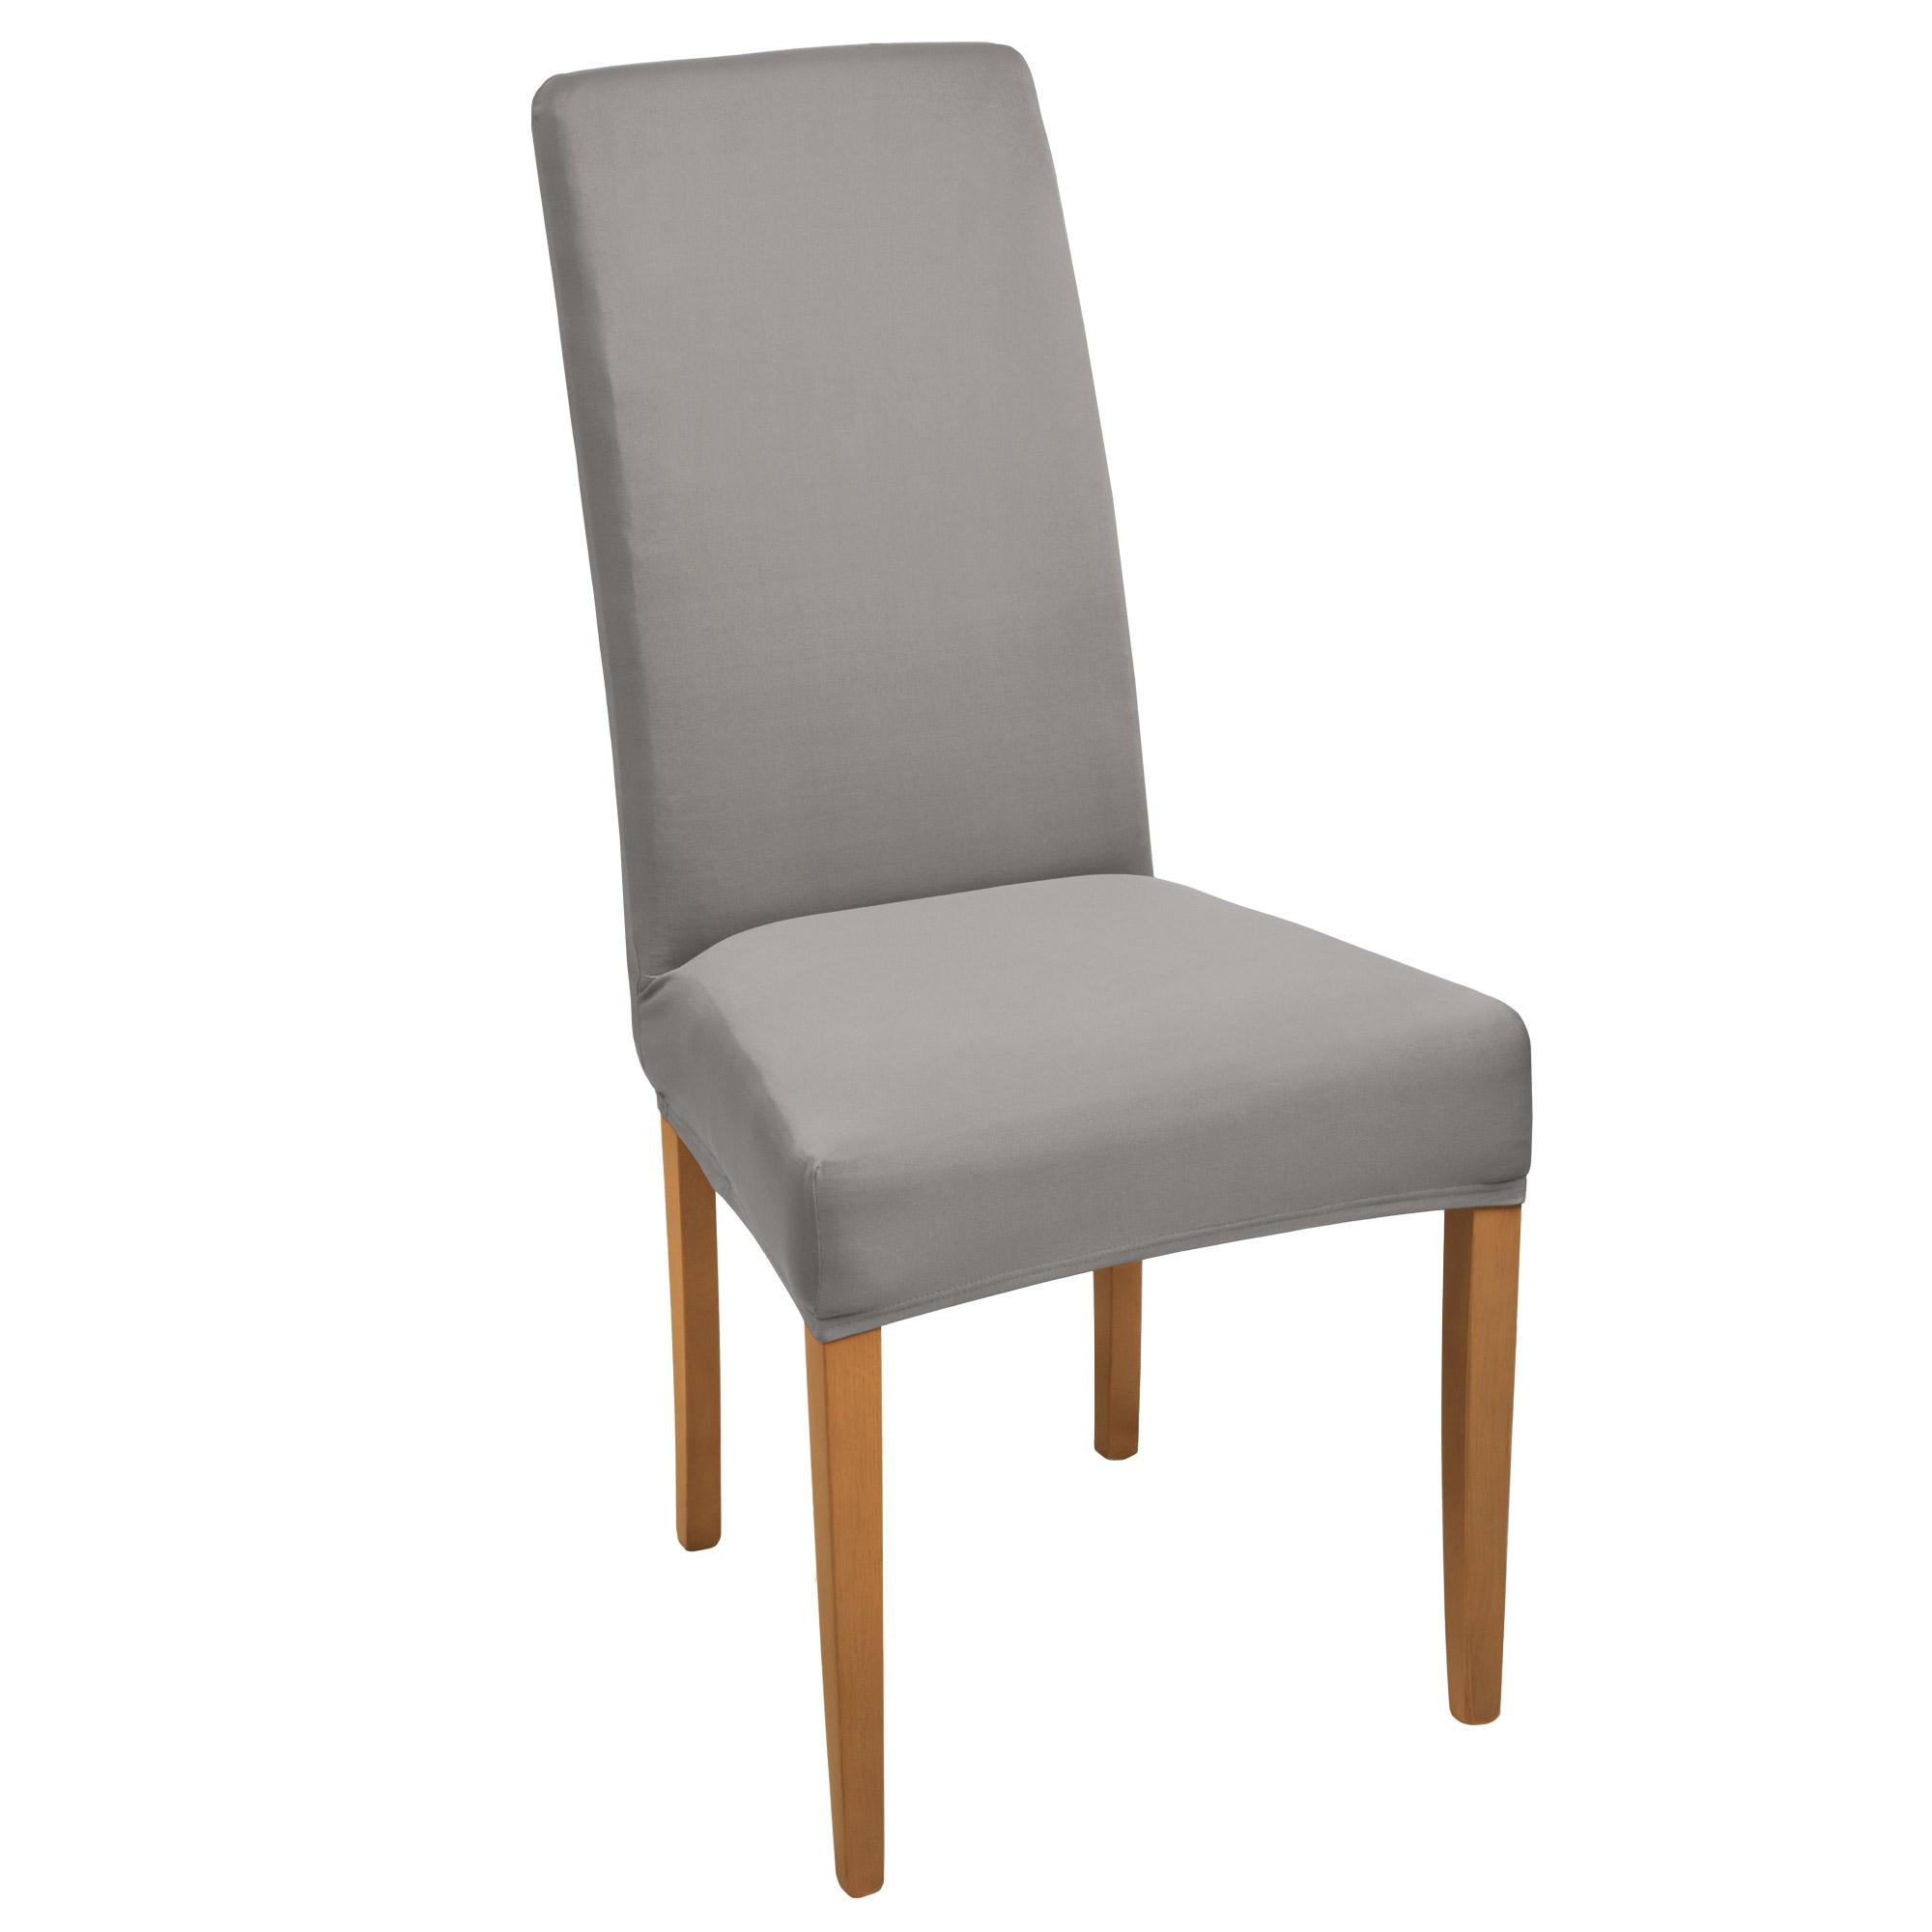 stuhlhusse stretch kurz mia anthrazit online kaufen. Black Bedroom Furniture Sets. Home Design Ideas